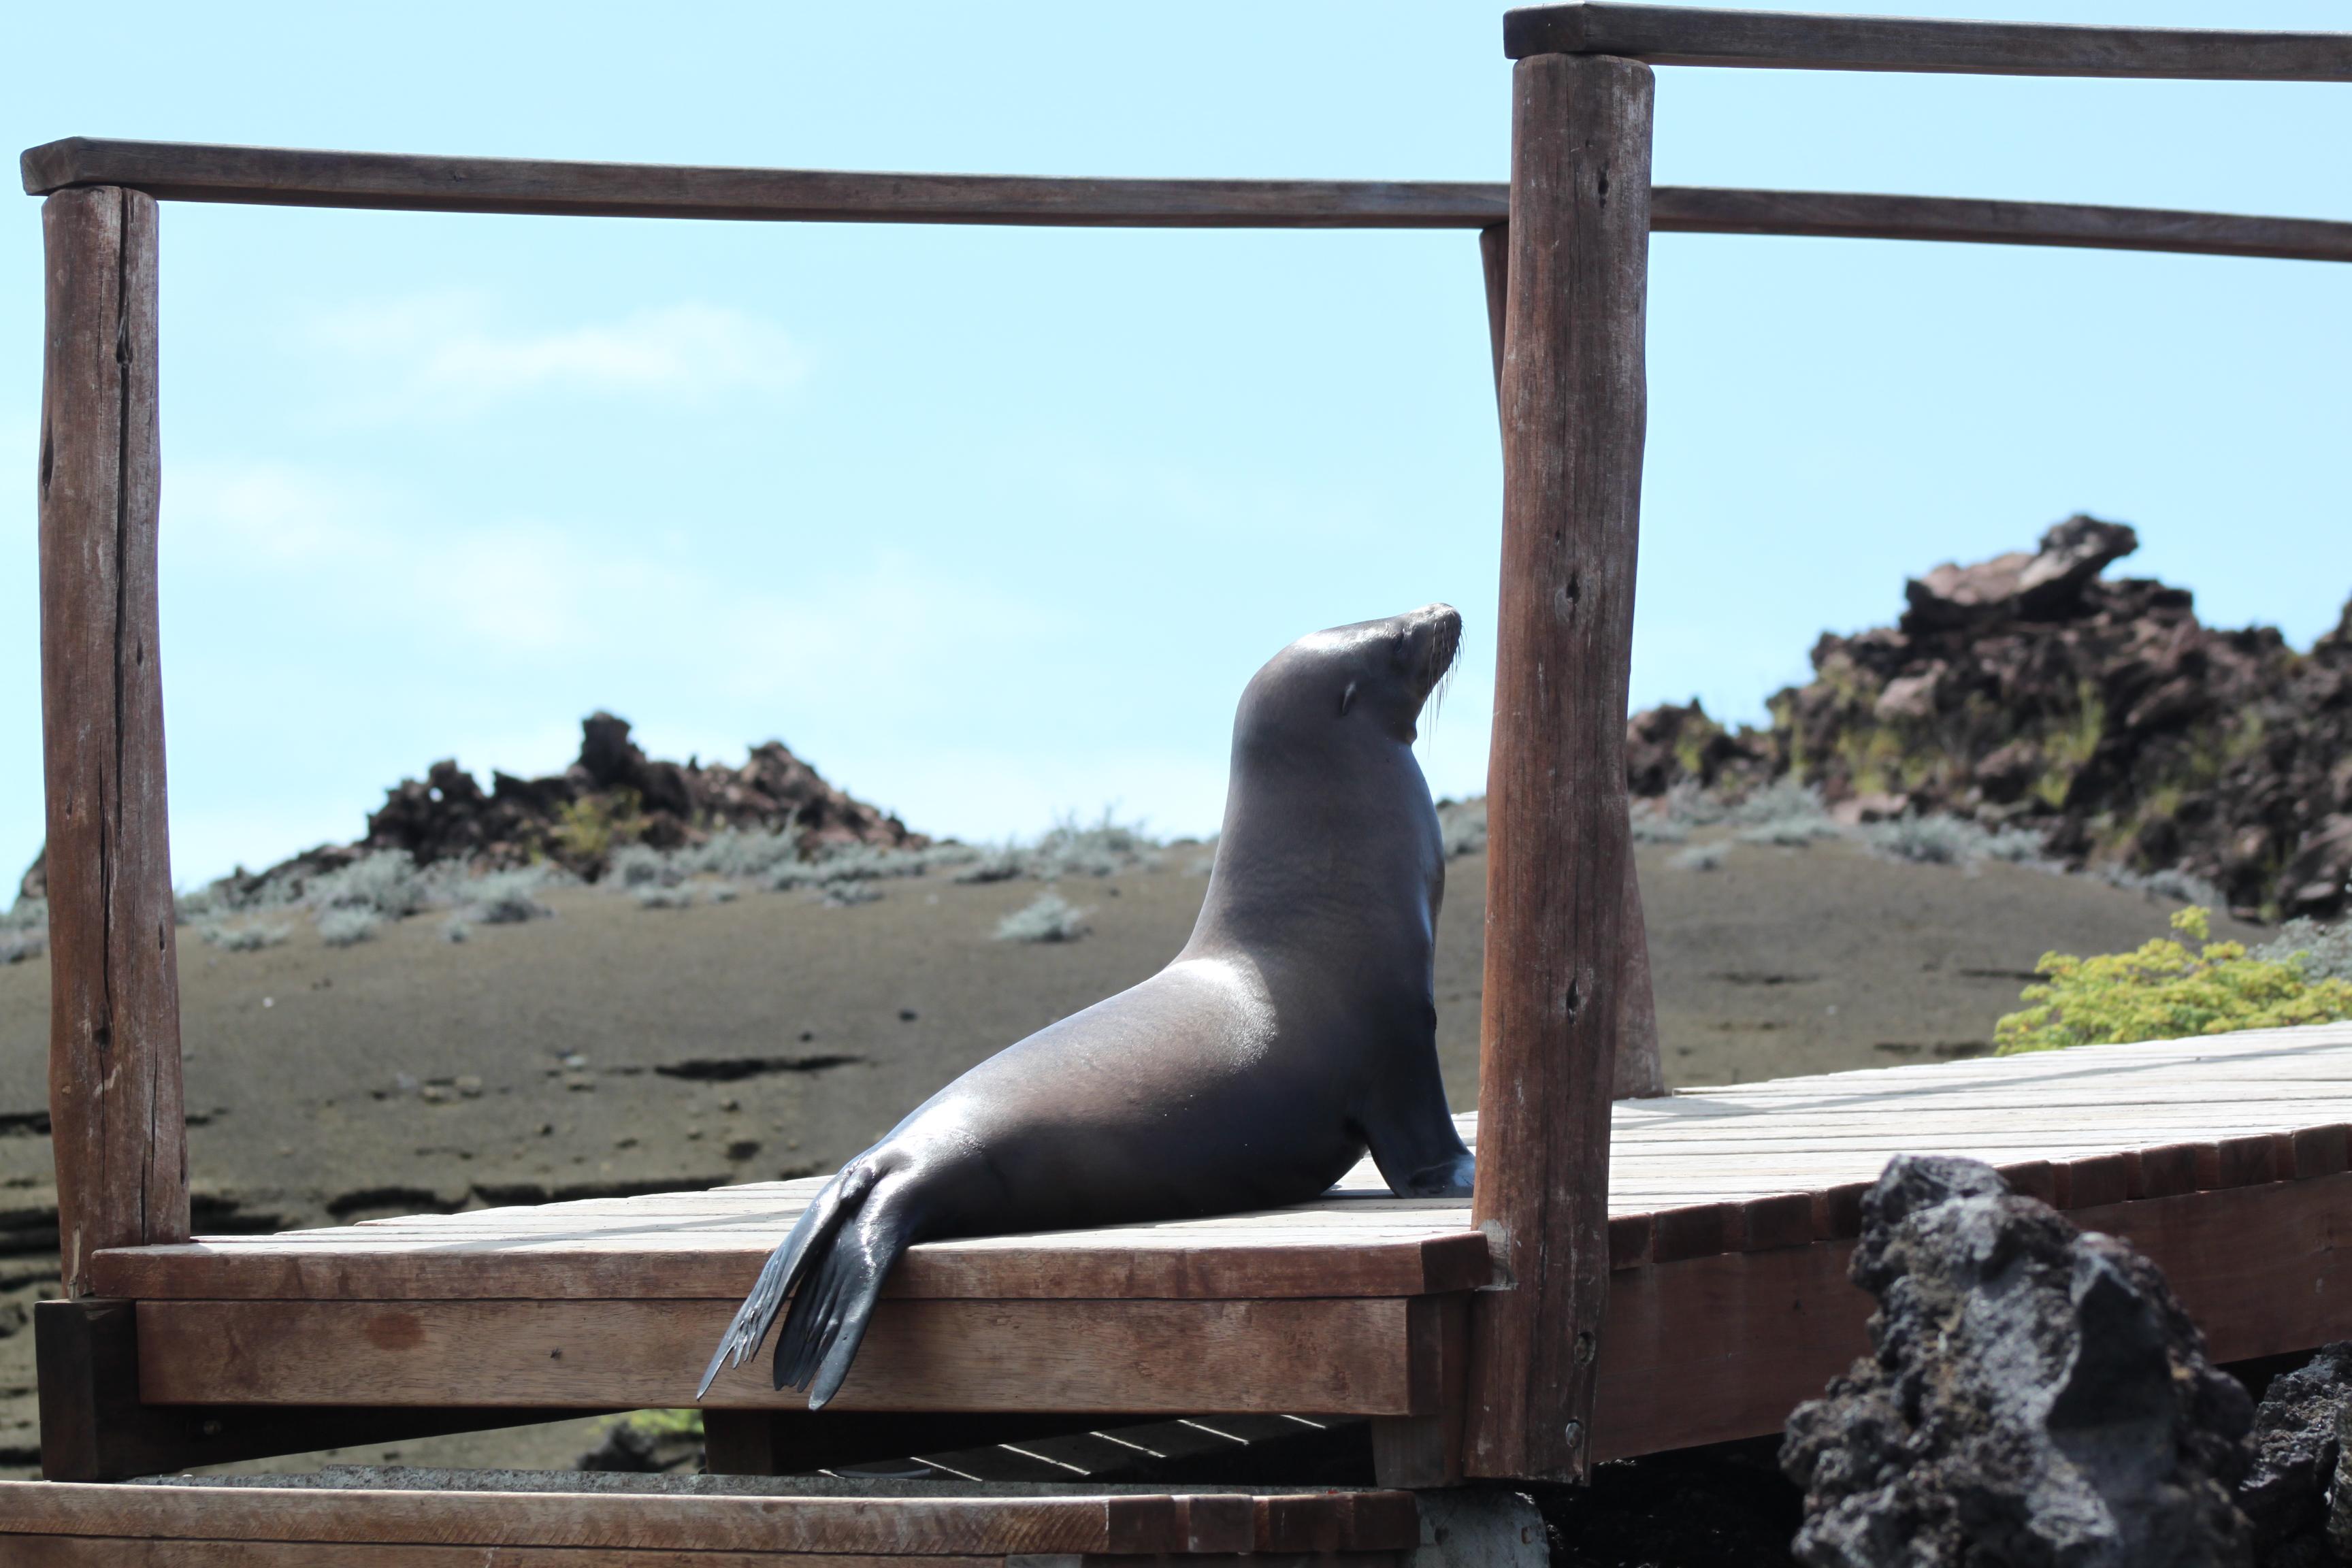 Sea-lion-gets-some-sun_rdellr-1-